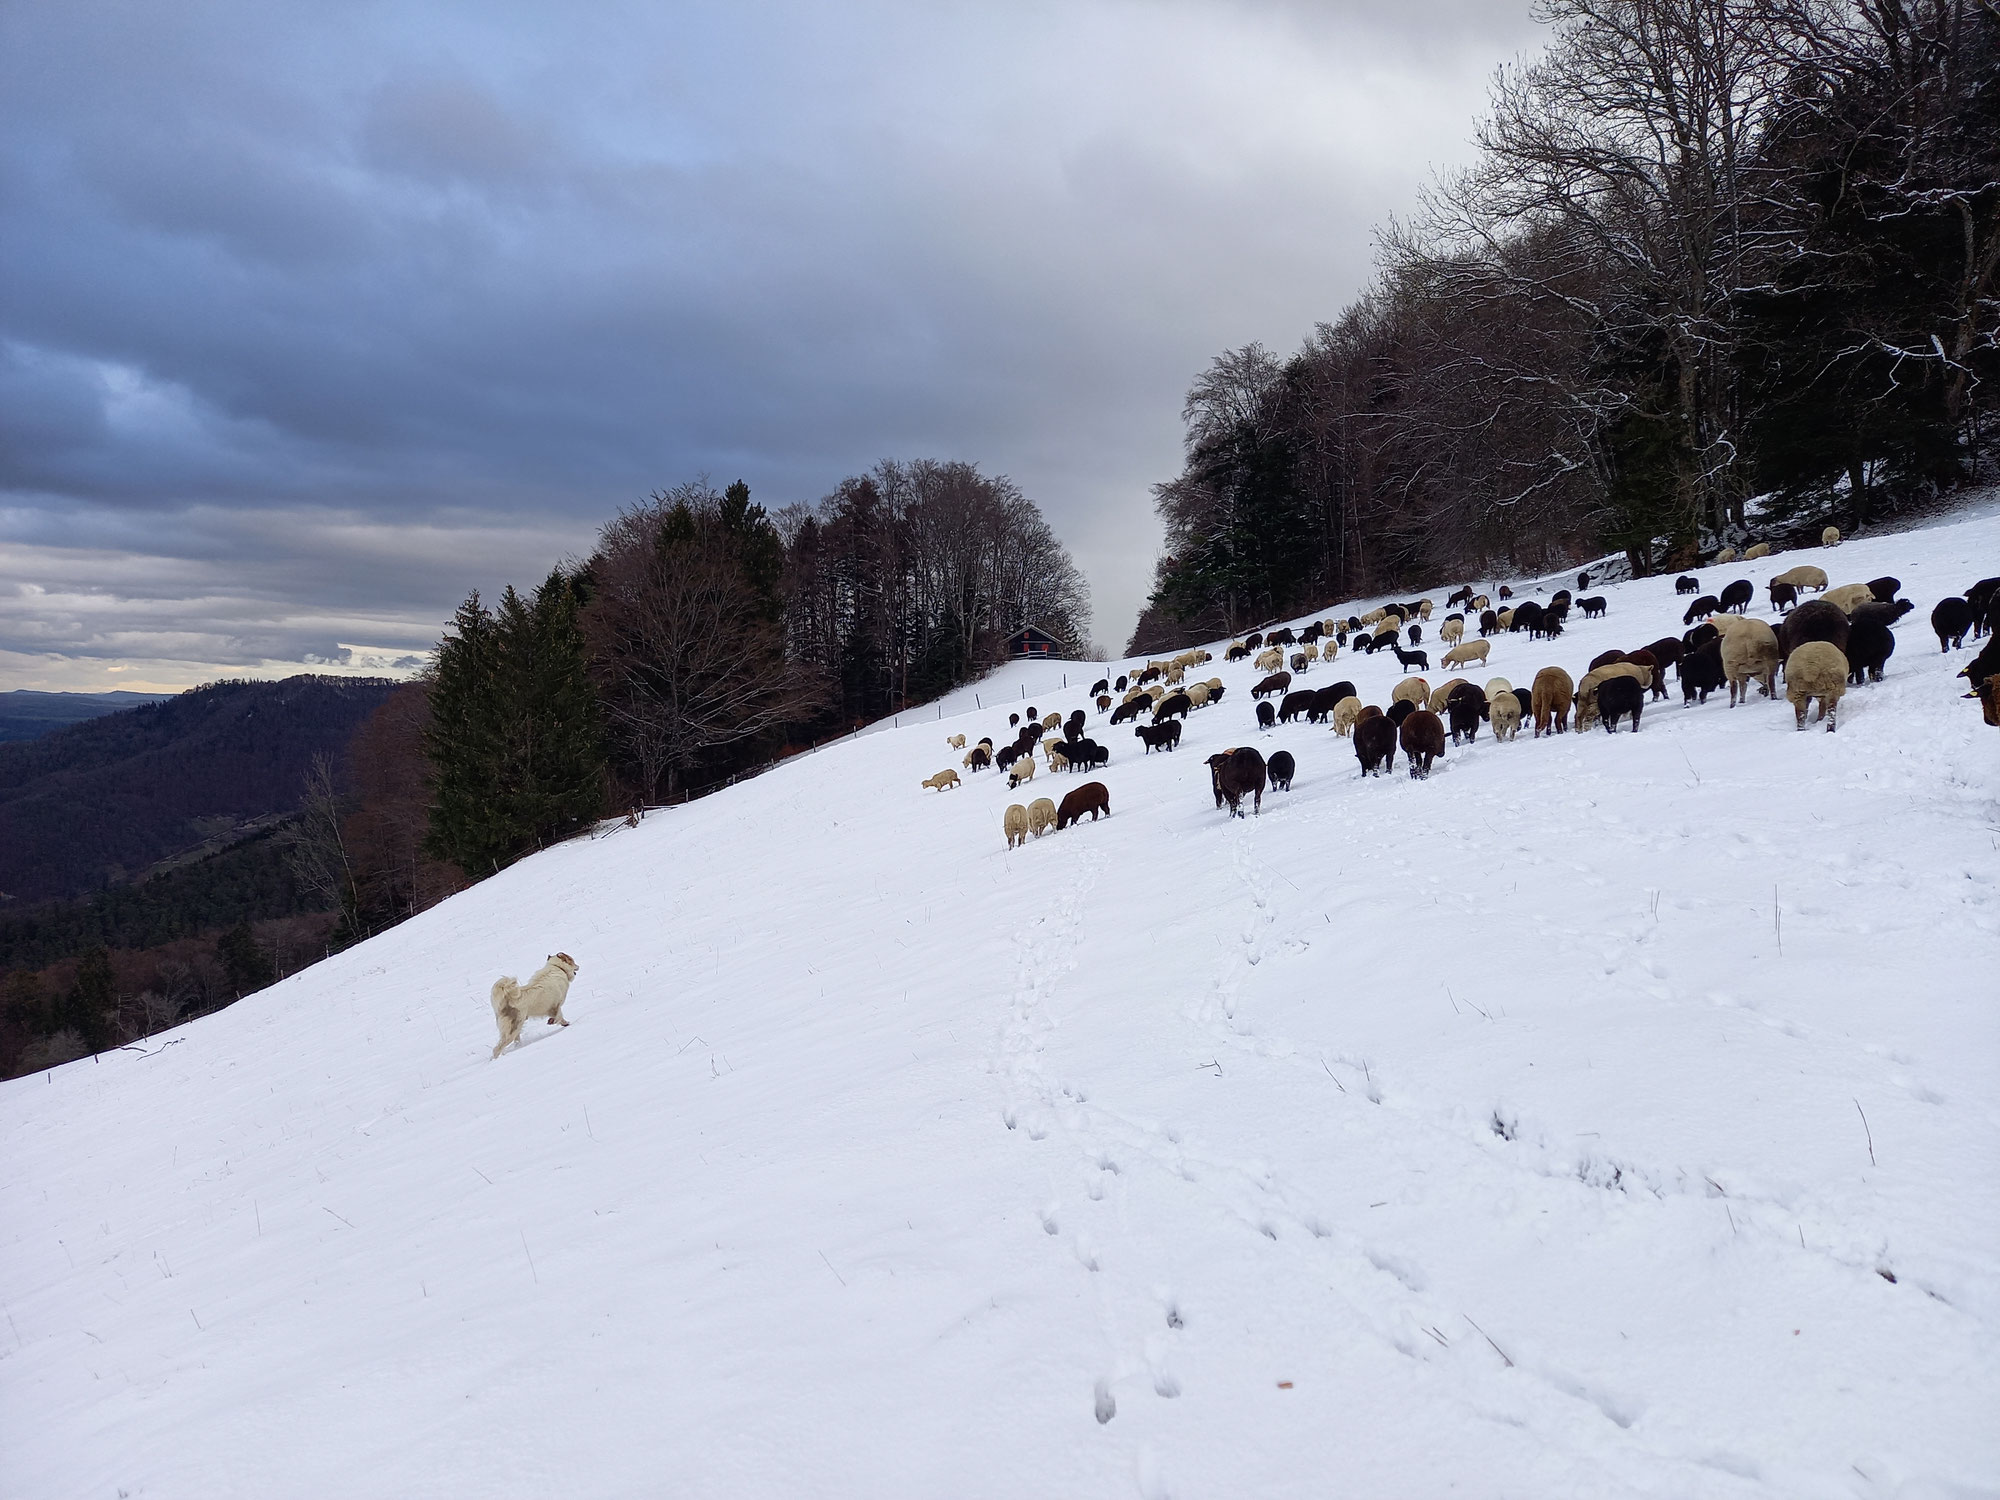 Winter - Sturm